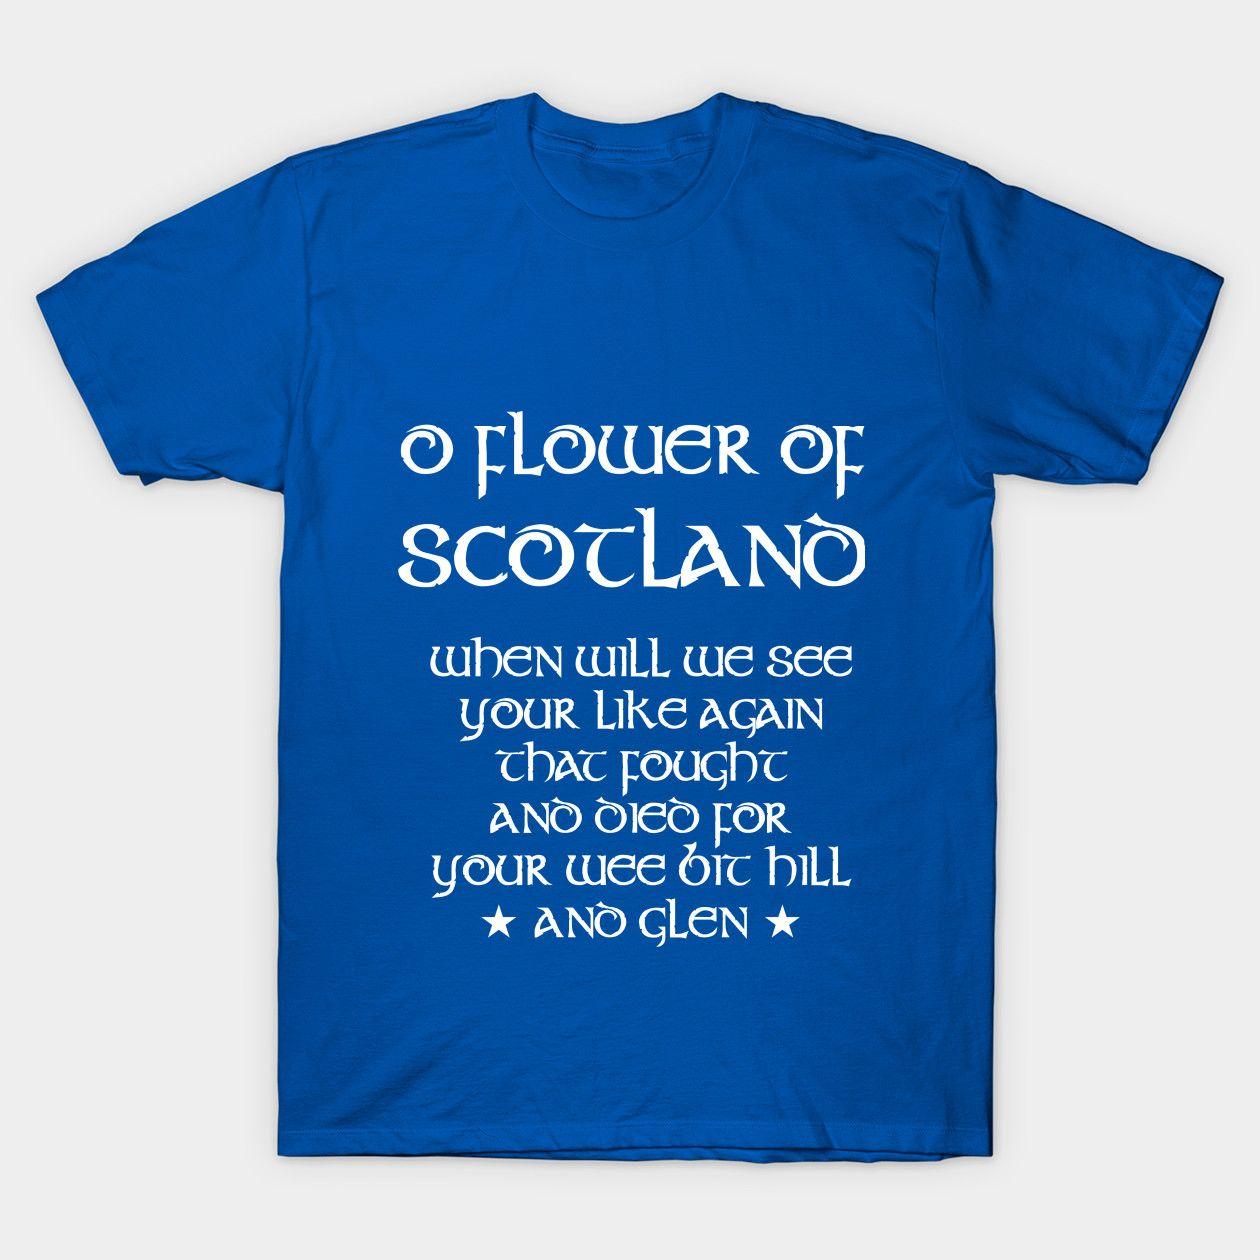 Scotland national anthem — Flower of Scotland flowerof